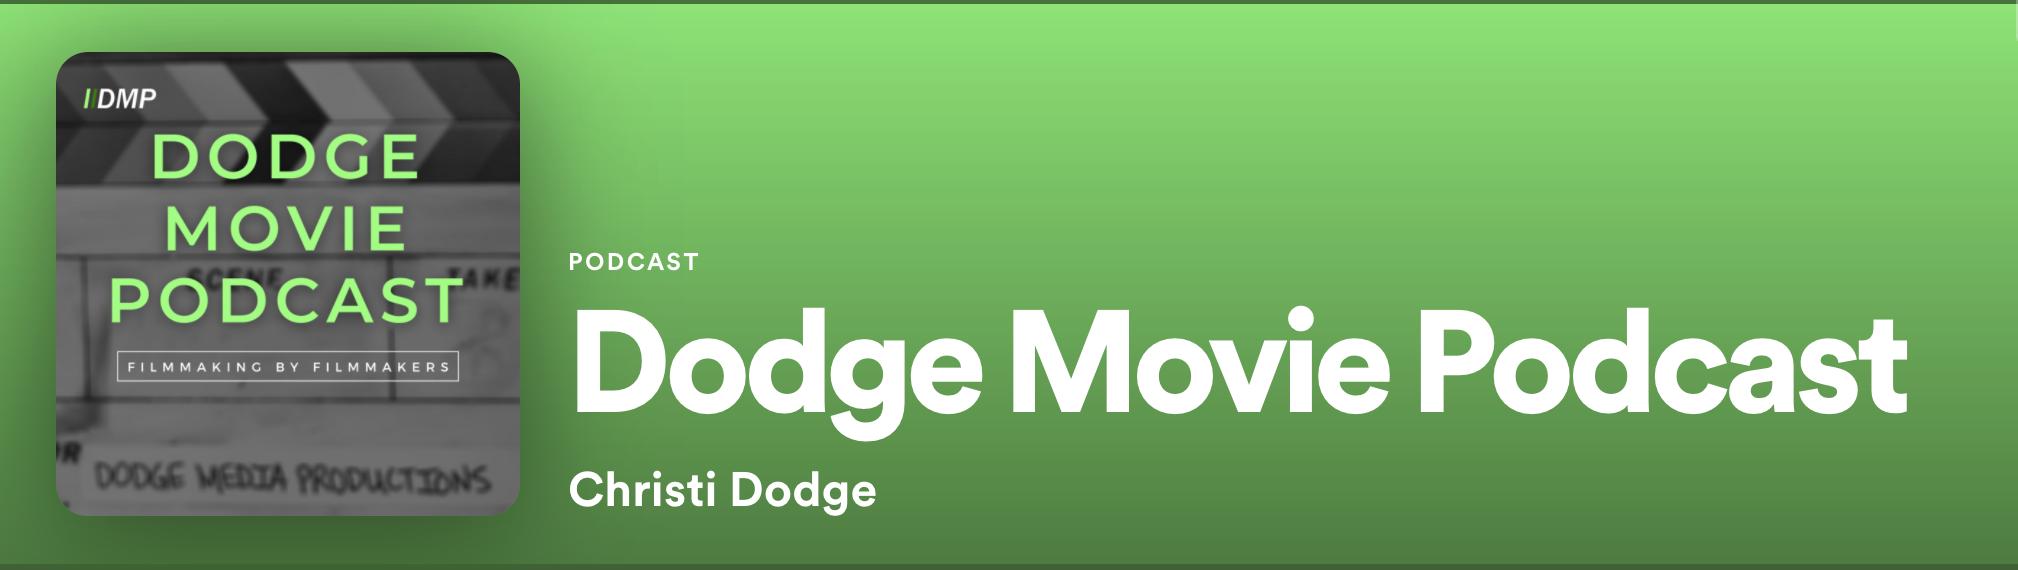 Dodge Movie Podcast trailer link